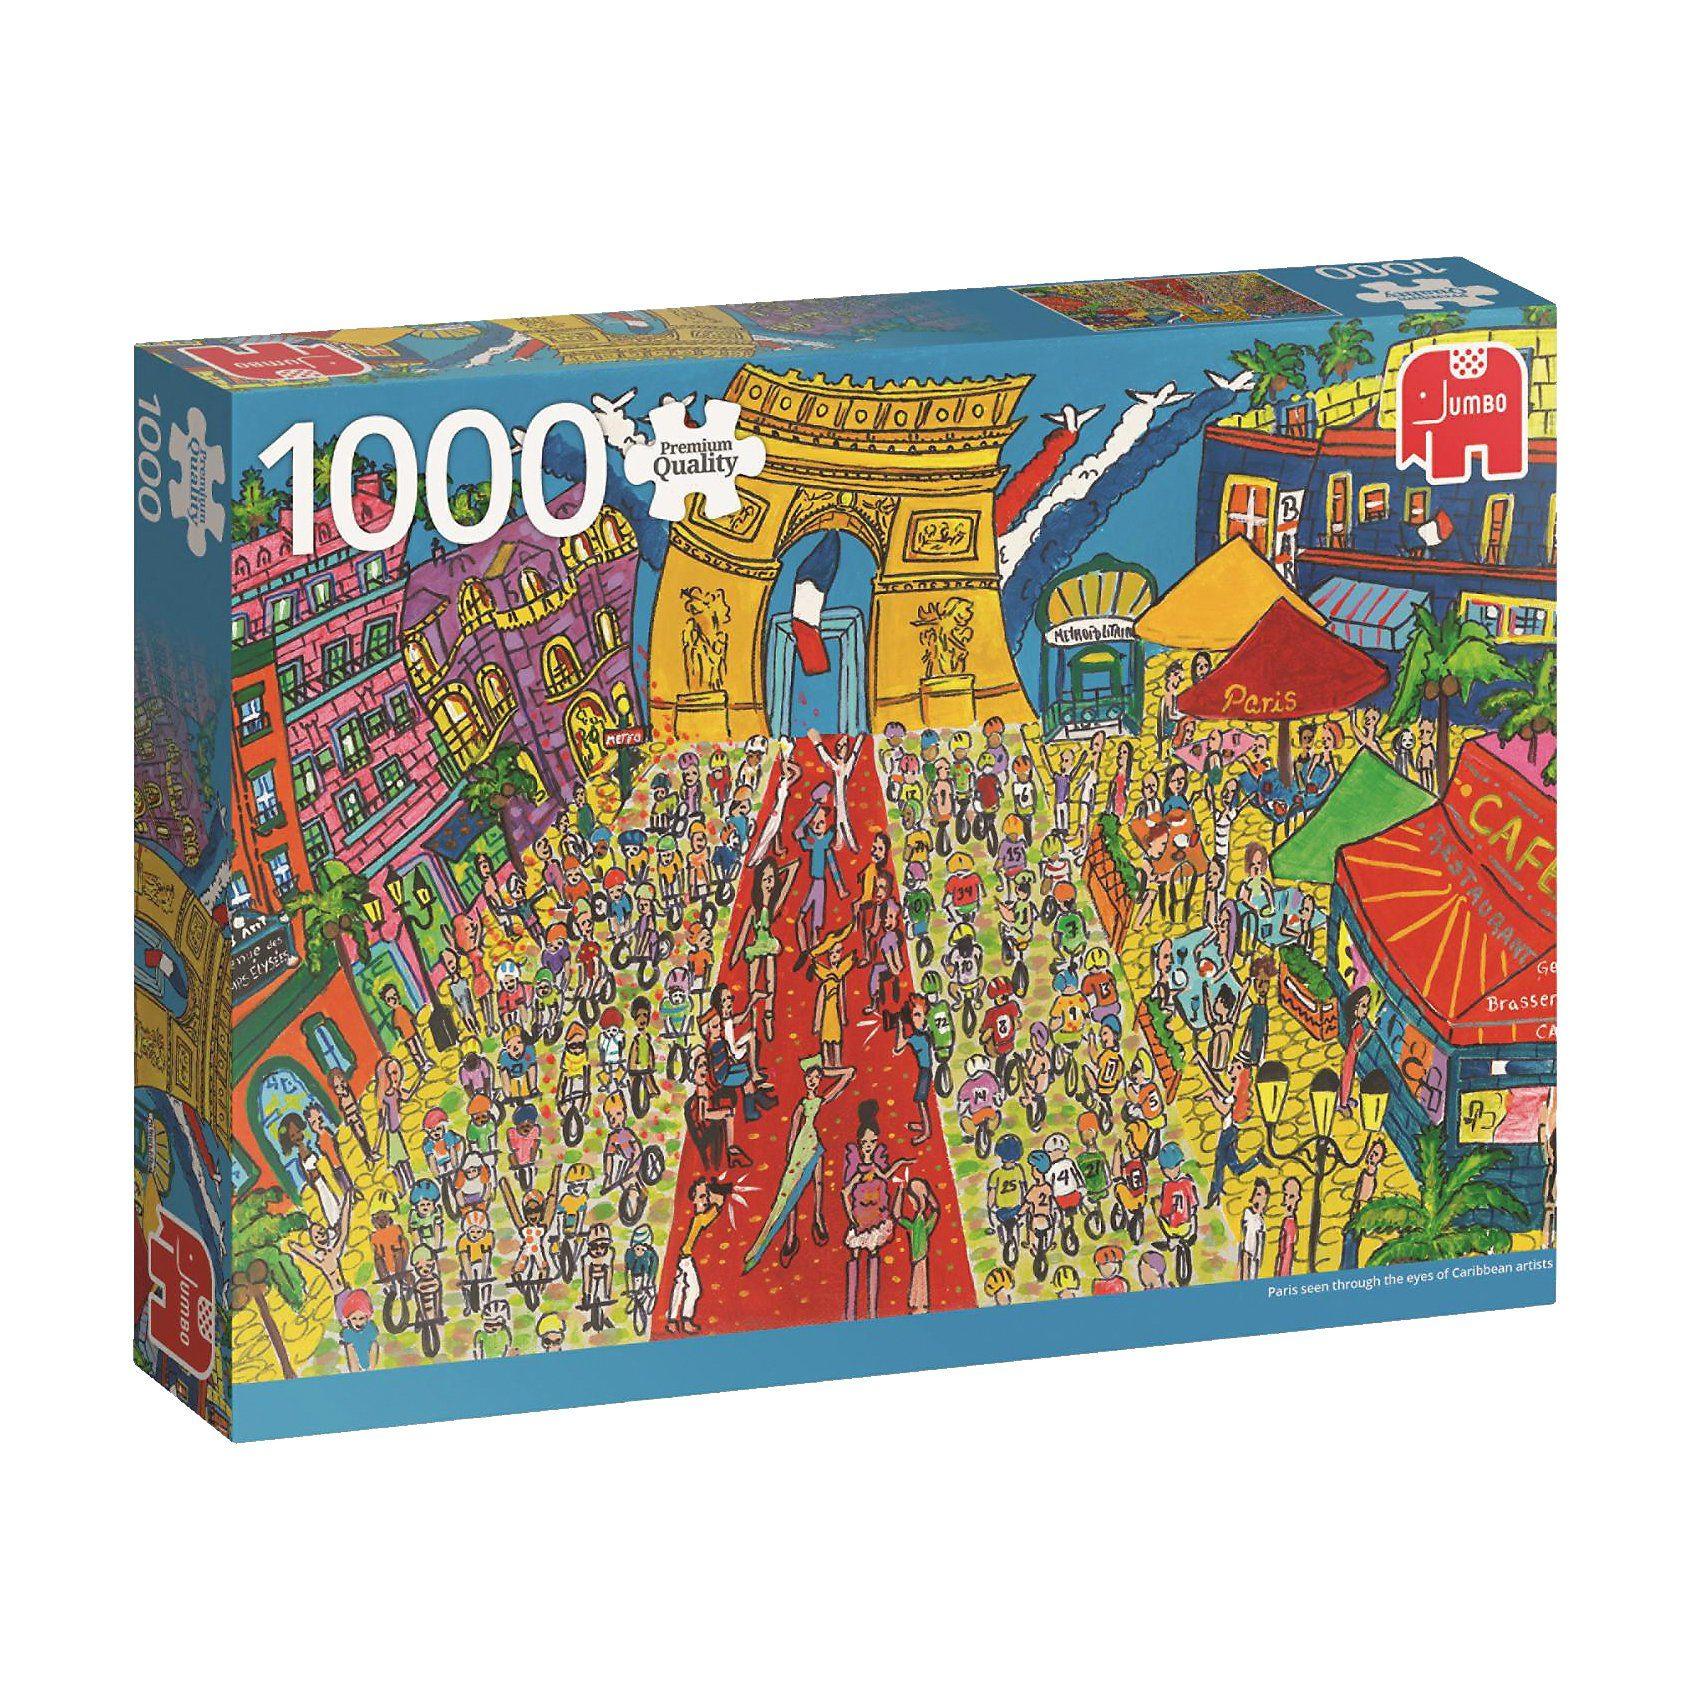 Jumbo Puzzle 1000 Teile - Sightseeing Arc de Triomphe, Paris